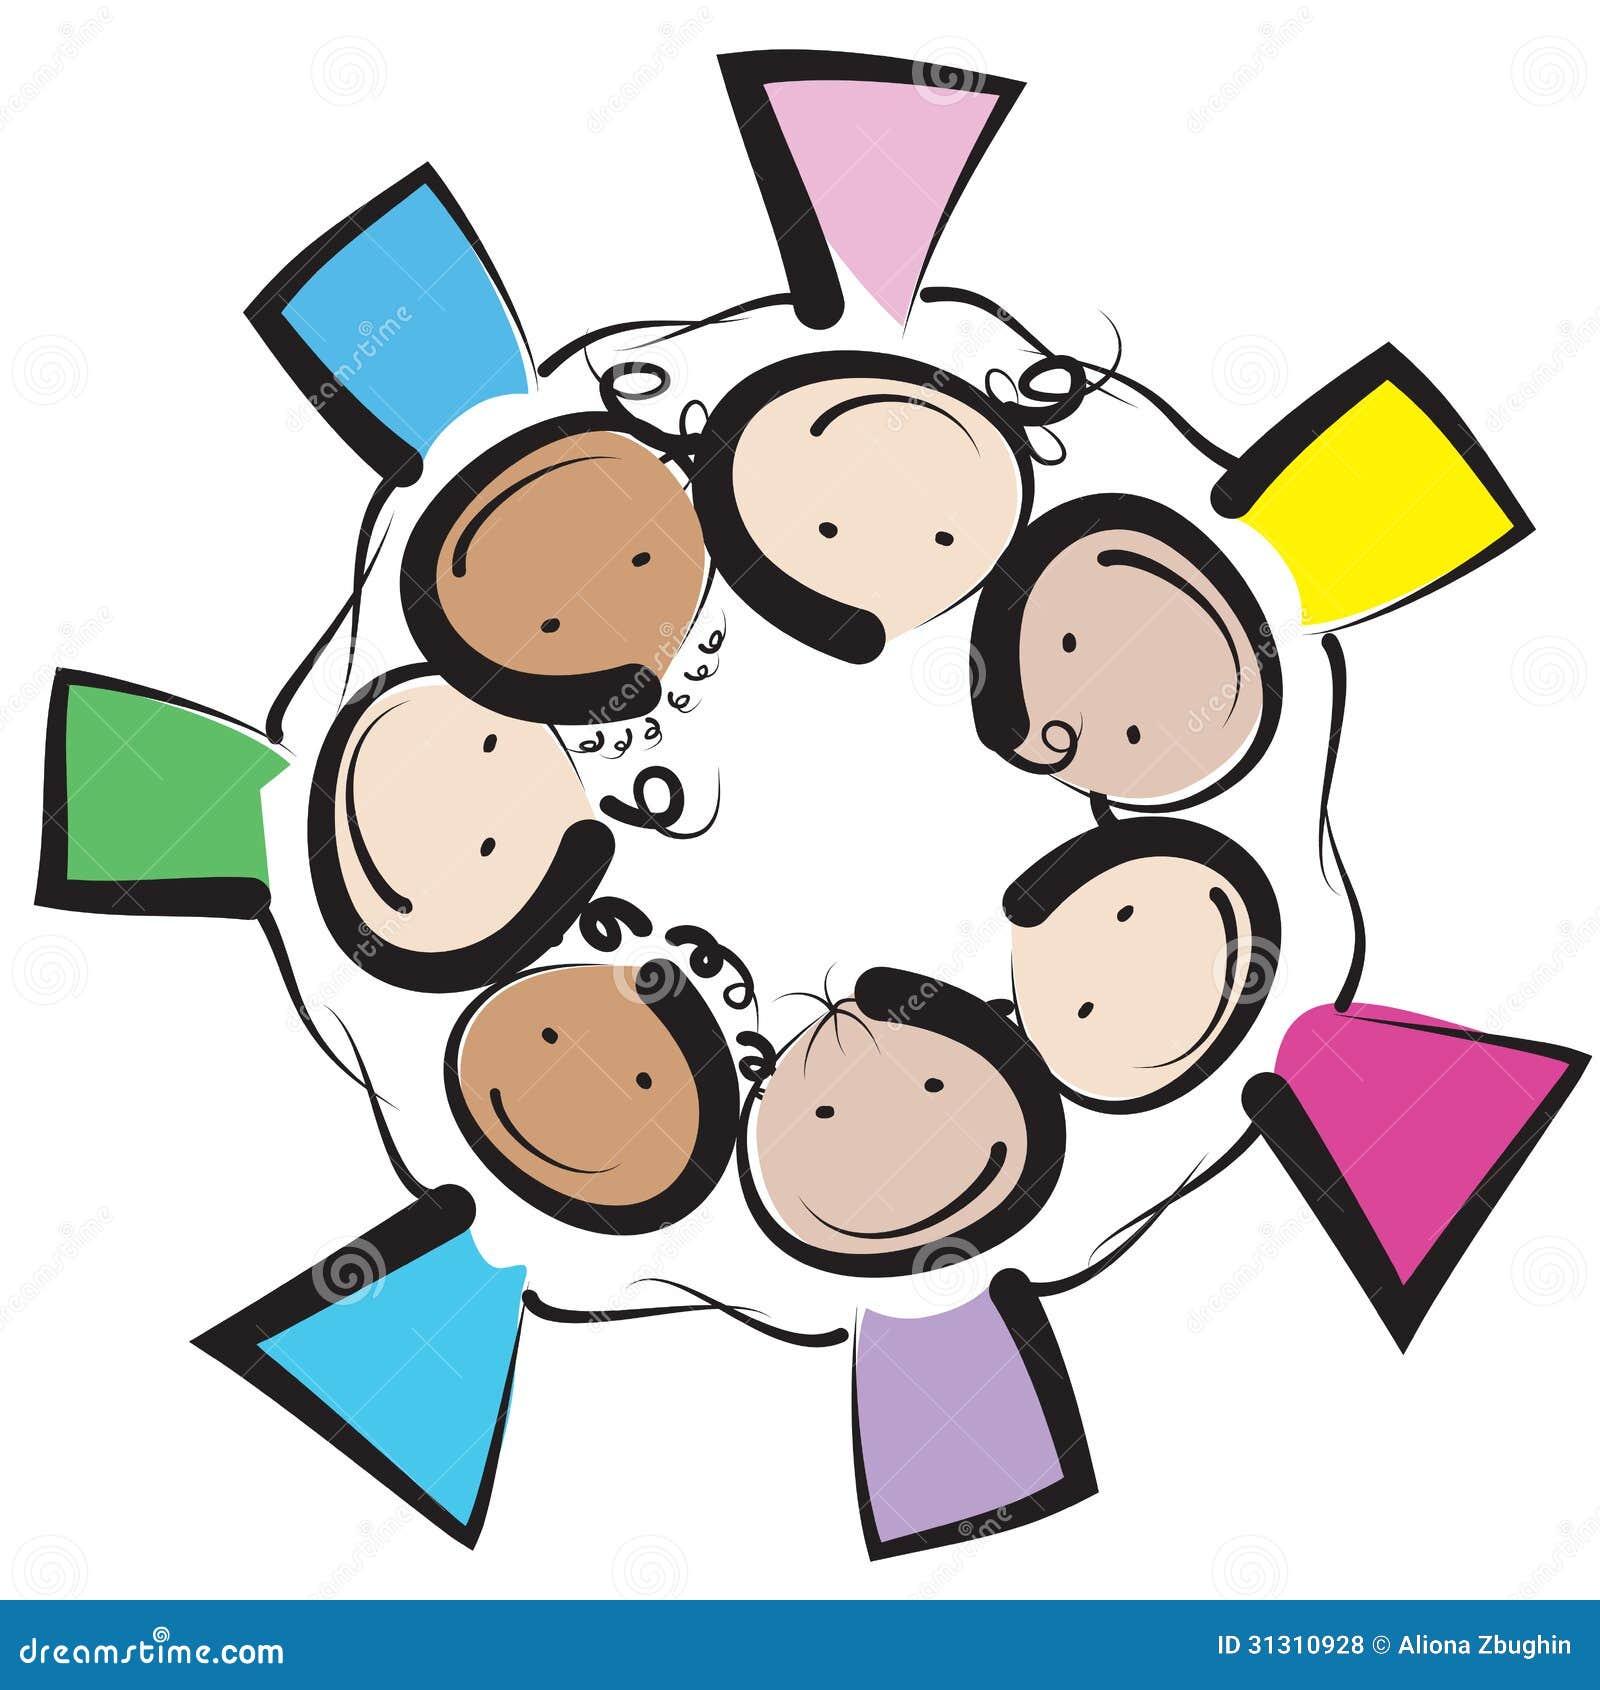 Kinderkreis clipart  Kinderkreis Lizenzfreie Stockfotos - Bild: 31310928